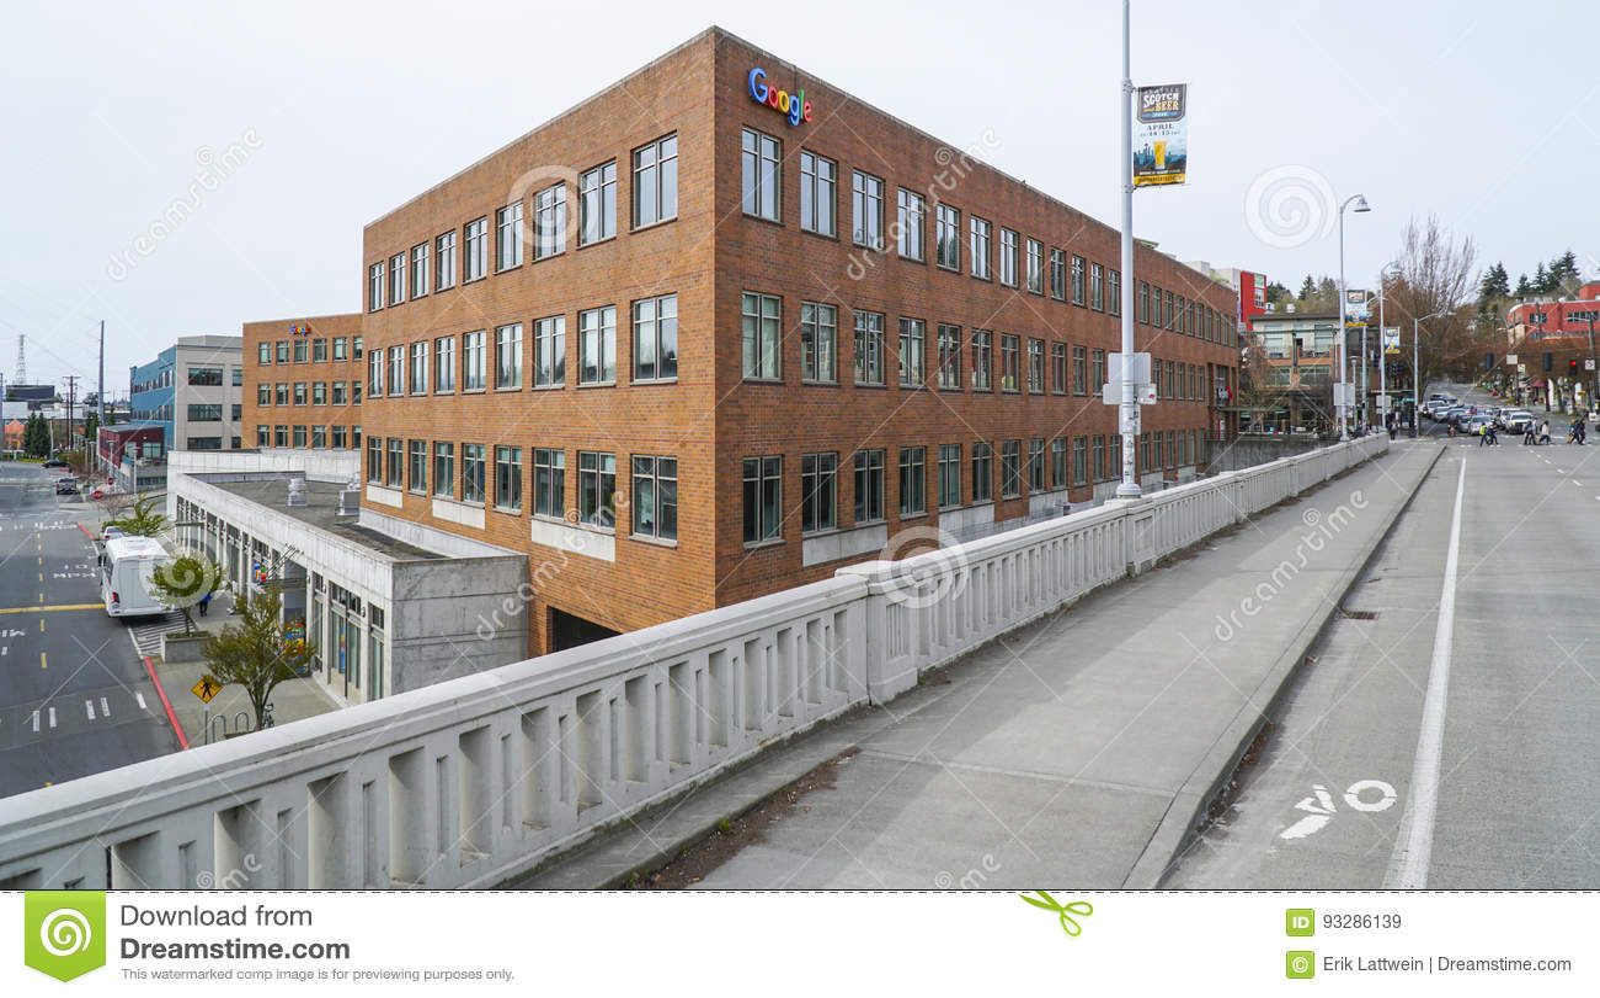 Google Maps Headquarter In Seattle - SEATTLE / WASHINGTON - APRIL 11 ...